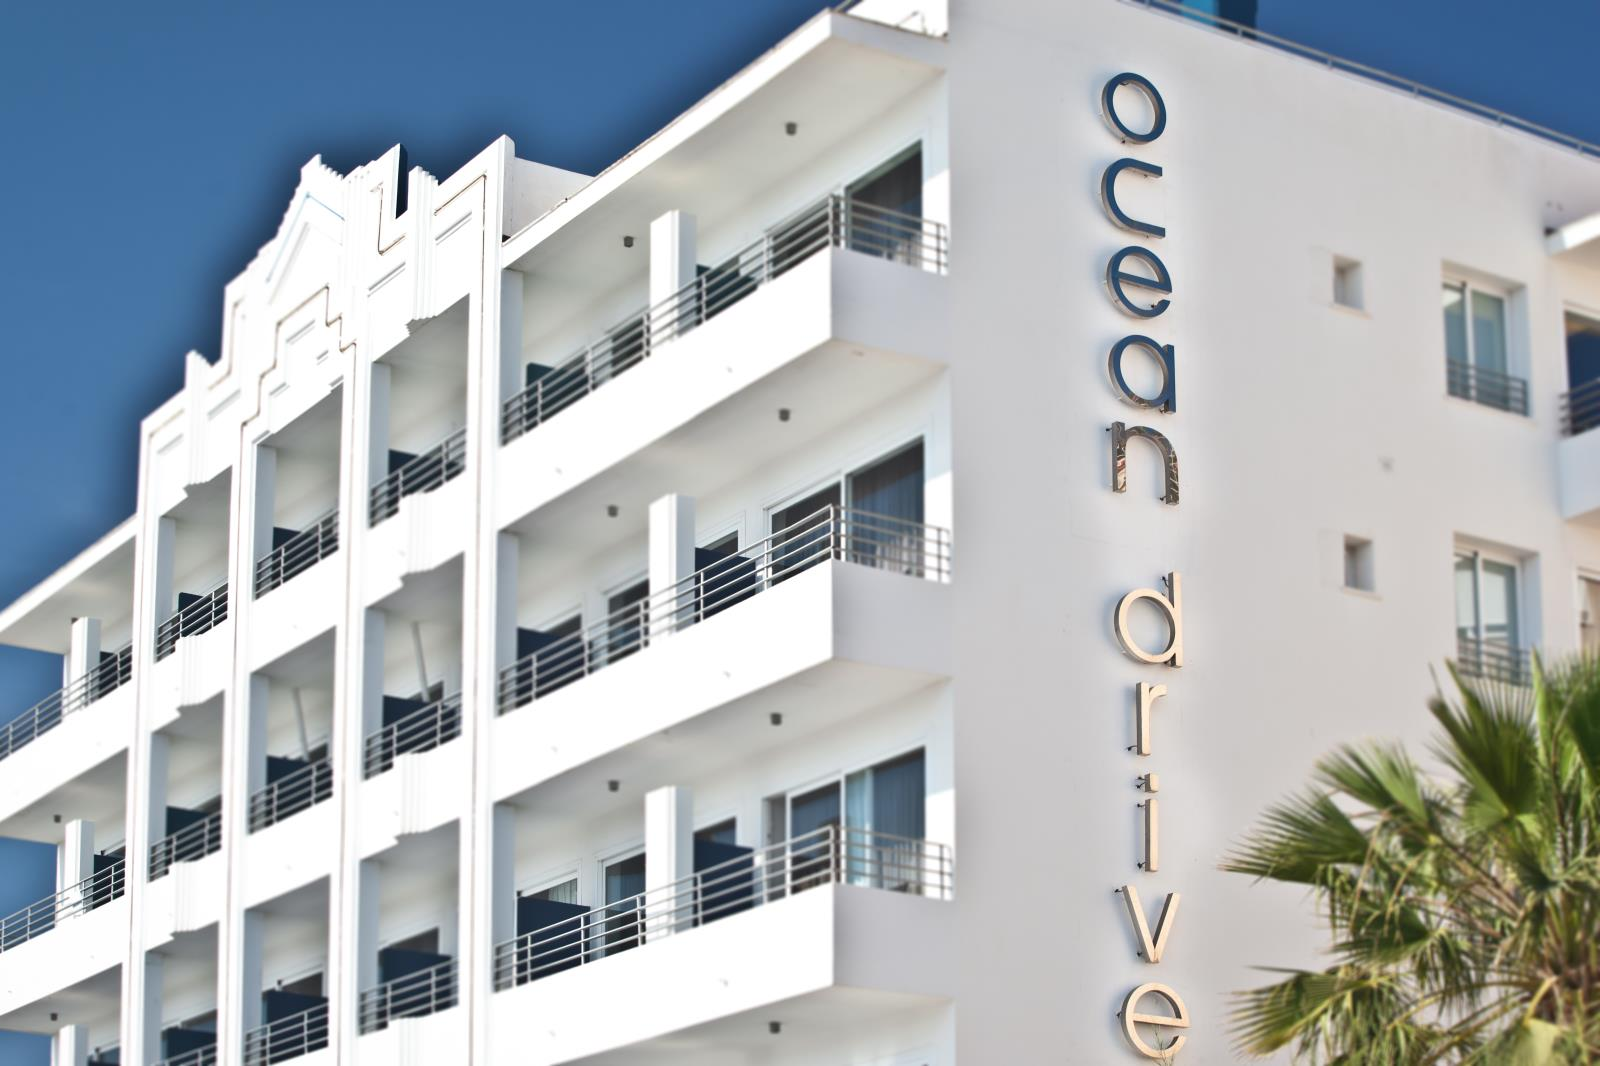 01-exterior-oceandrive-ibiza-01-1600x1200